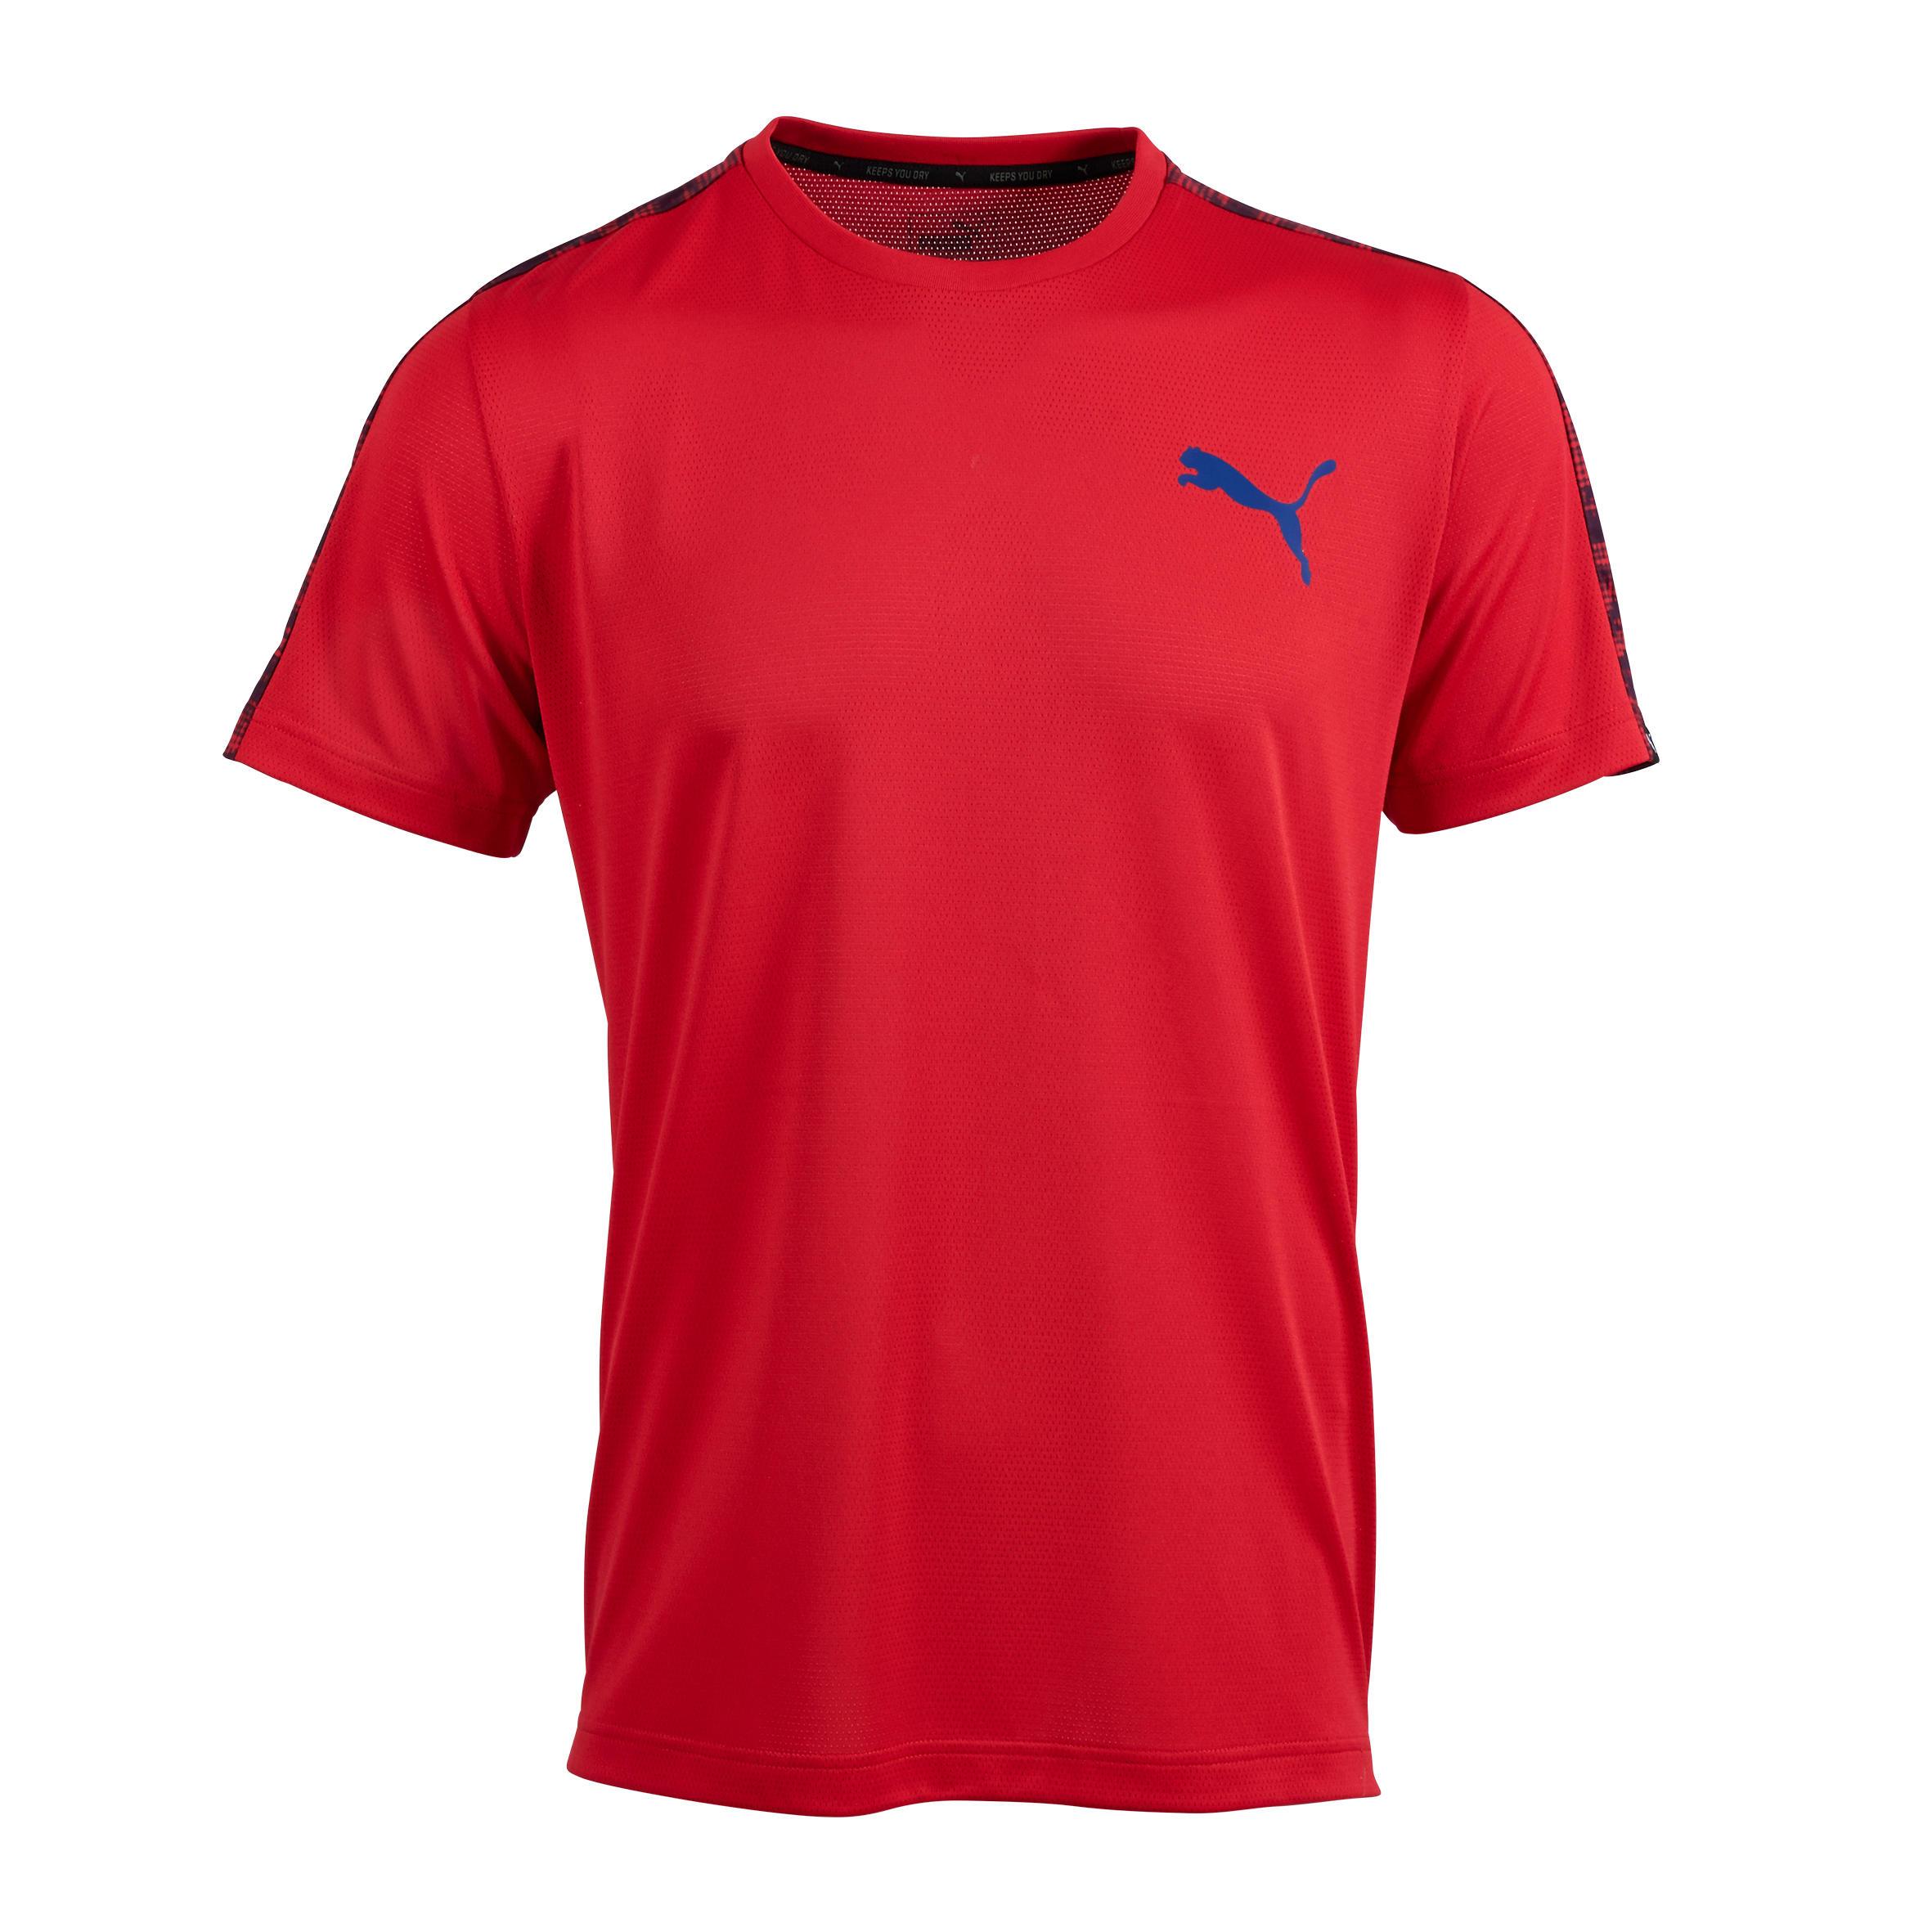 Puma Fitness T-shirt heren rood